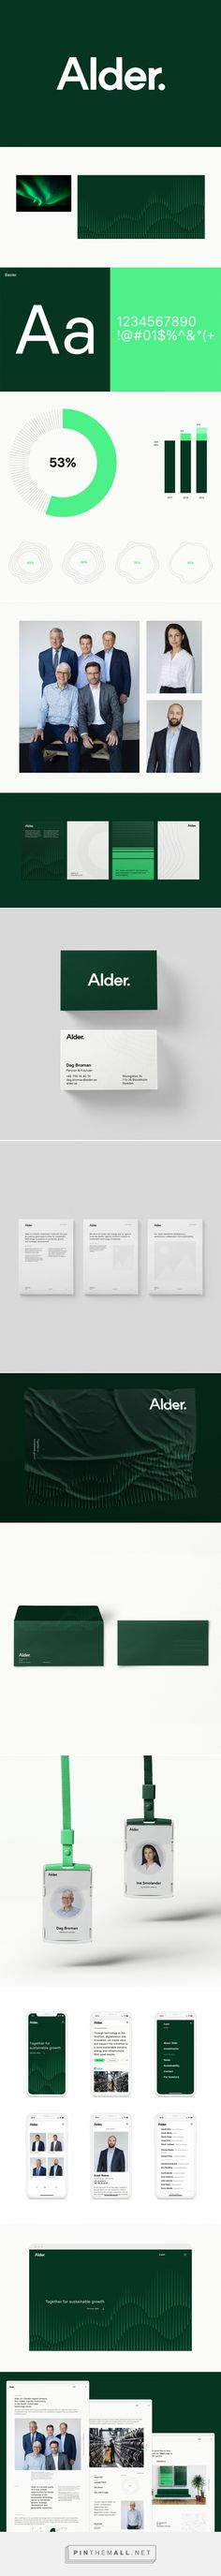 Alder – Brand Identity on Behance - Aleksander Jezierski Brand Identity Design, Corporate Design, Brand Design, Vertical Bike, Bike Rack, Logo Design Template, Design Web, Grafik Design, Lettering Design